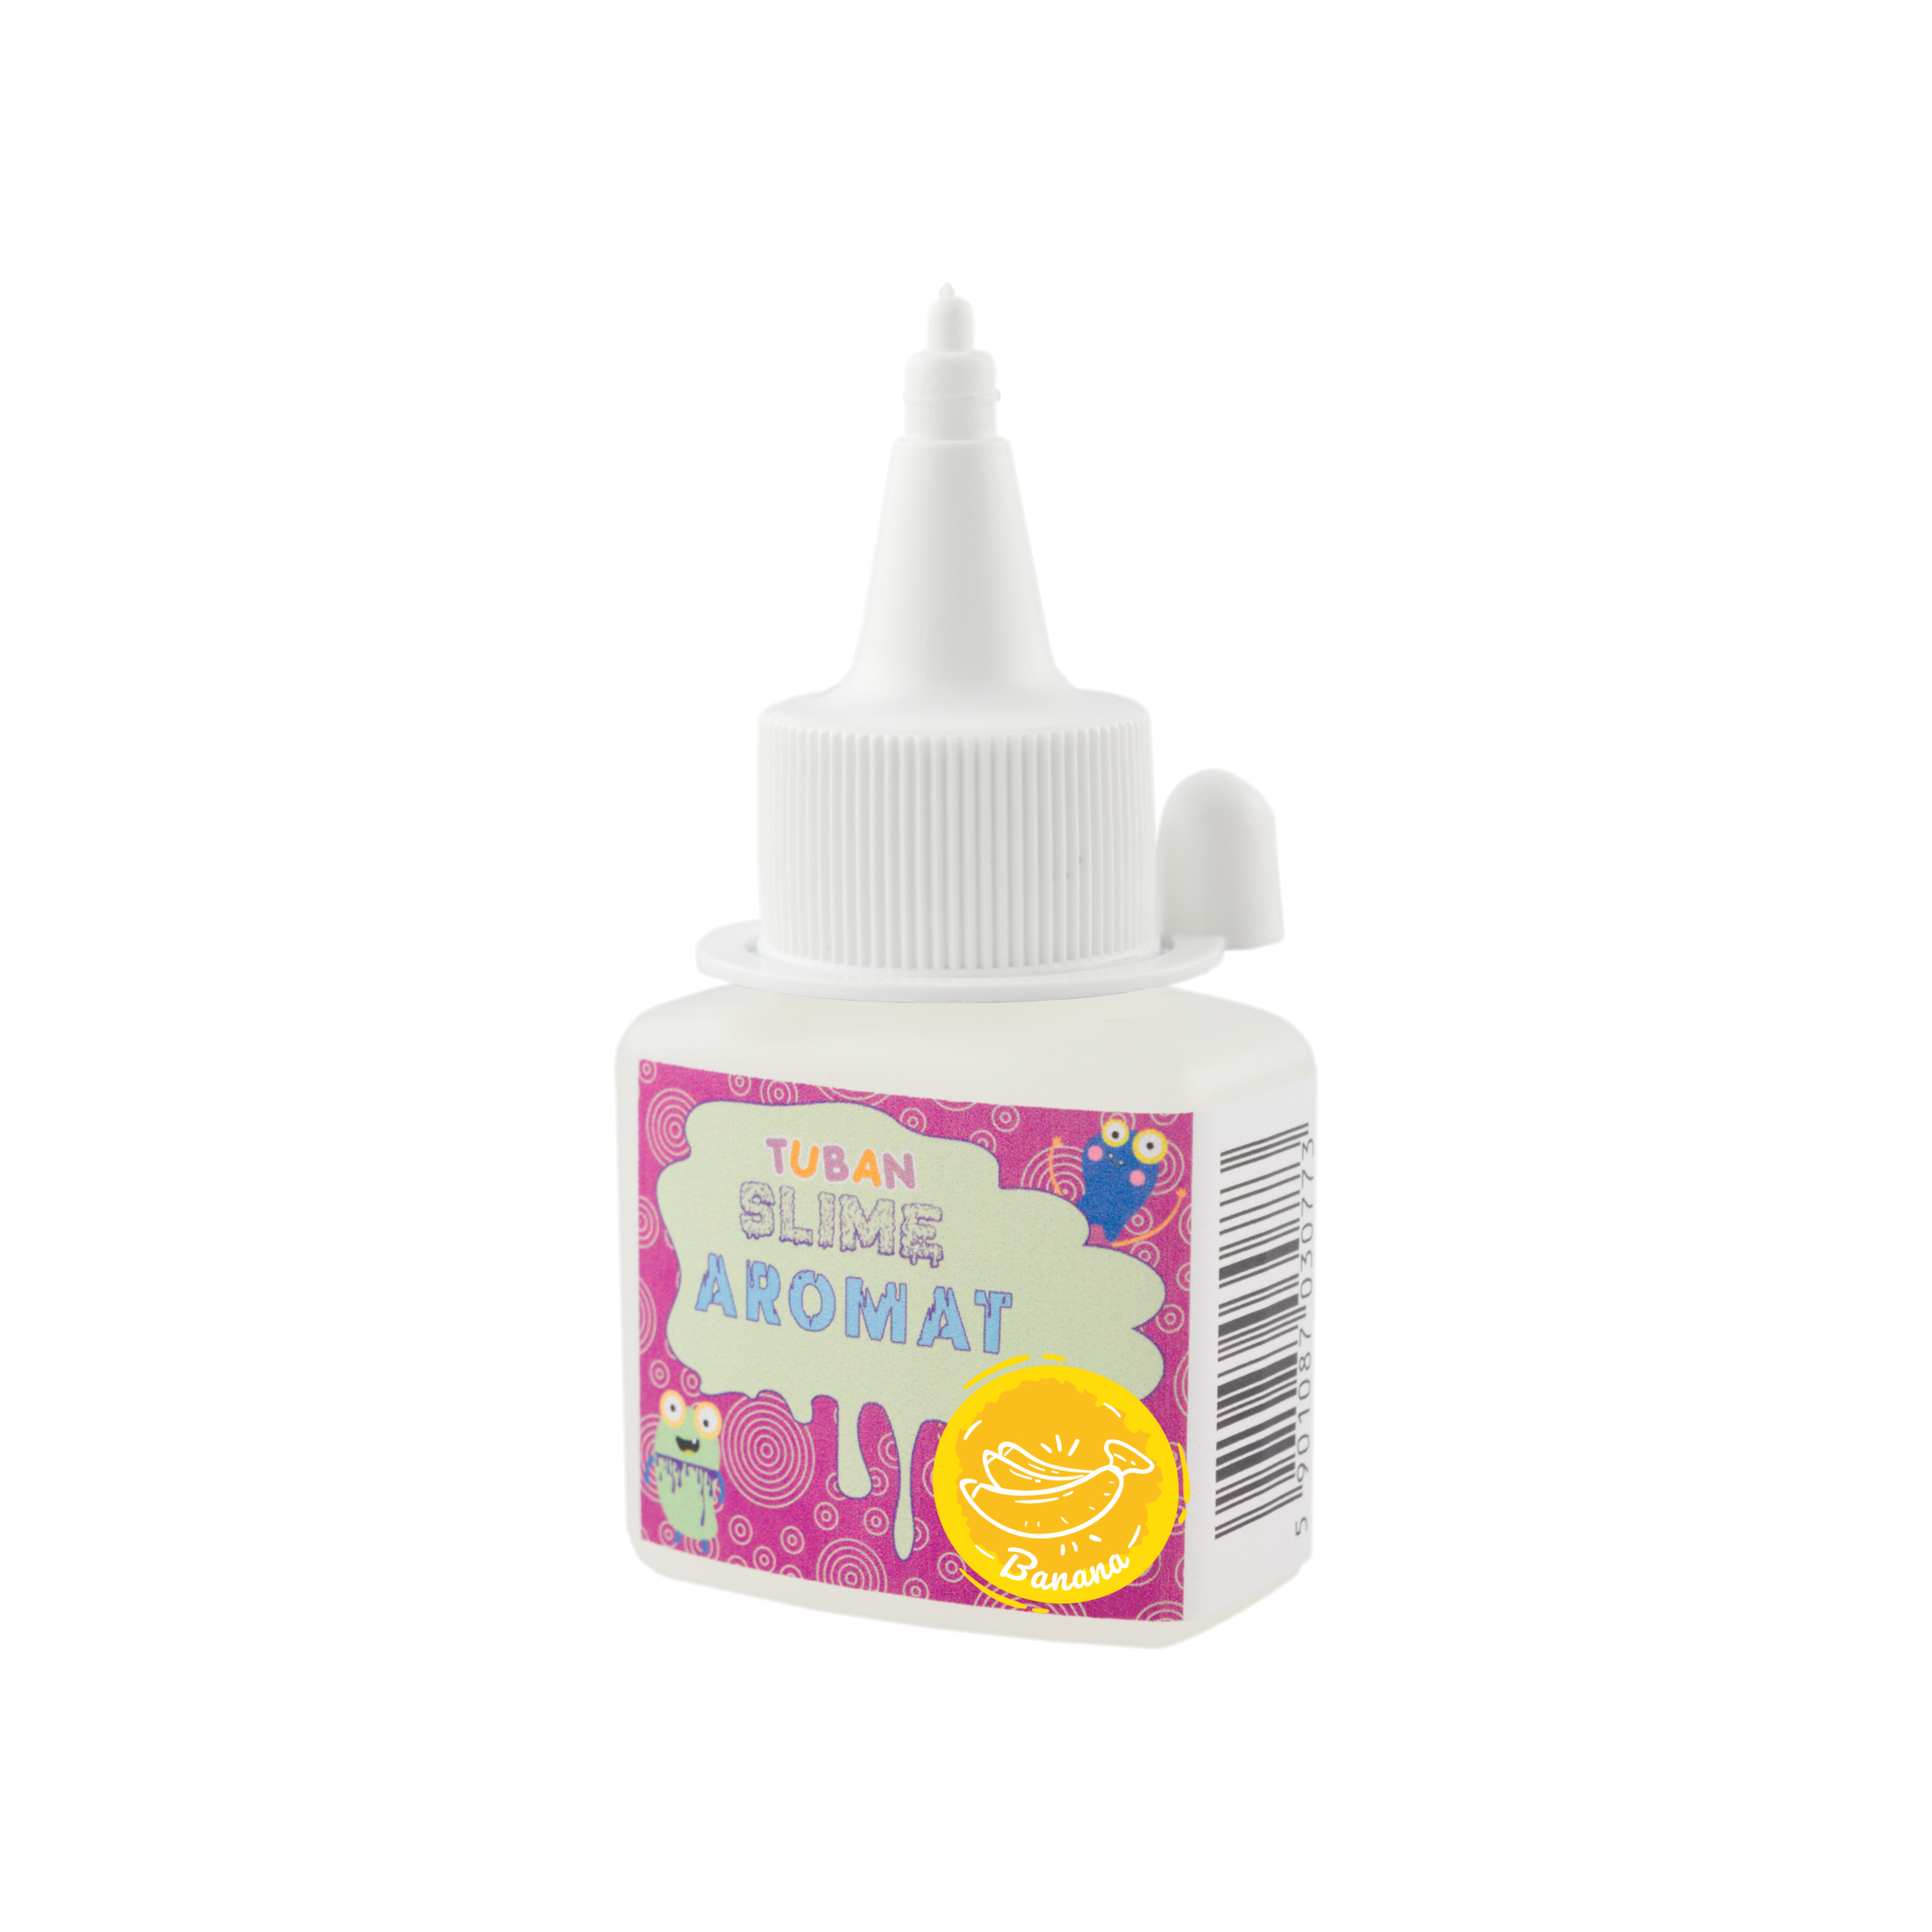 Tuban - Super Slime - Aroma mit Bananenduft - 35 ml - by Jablka